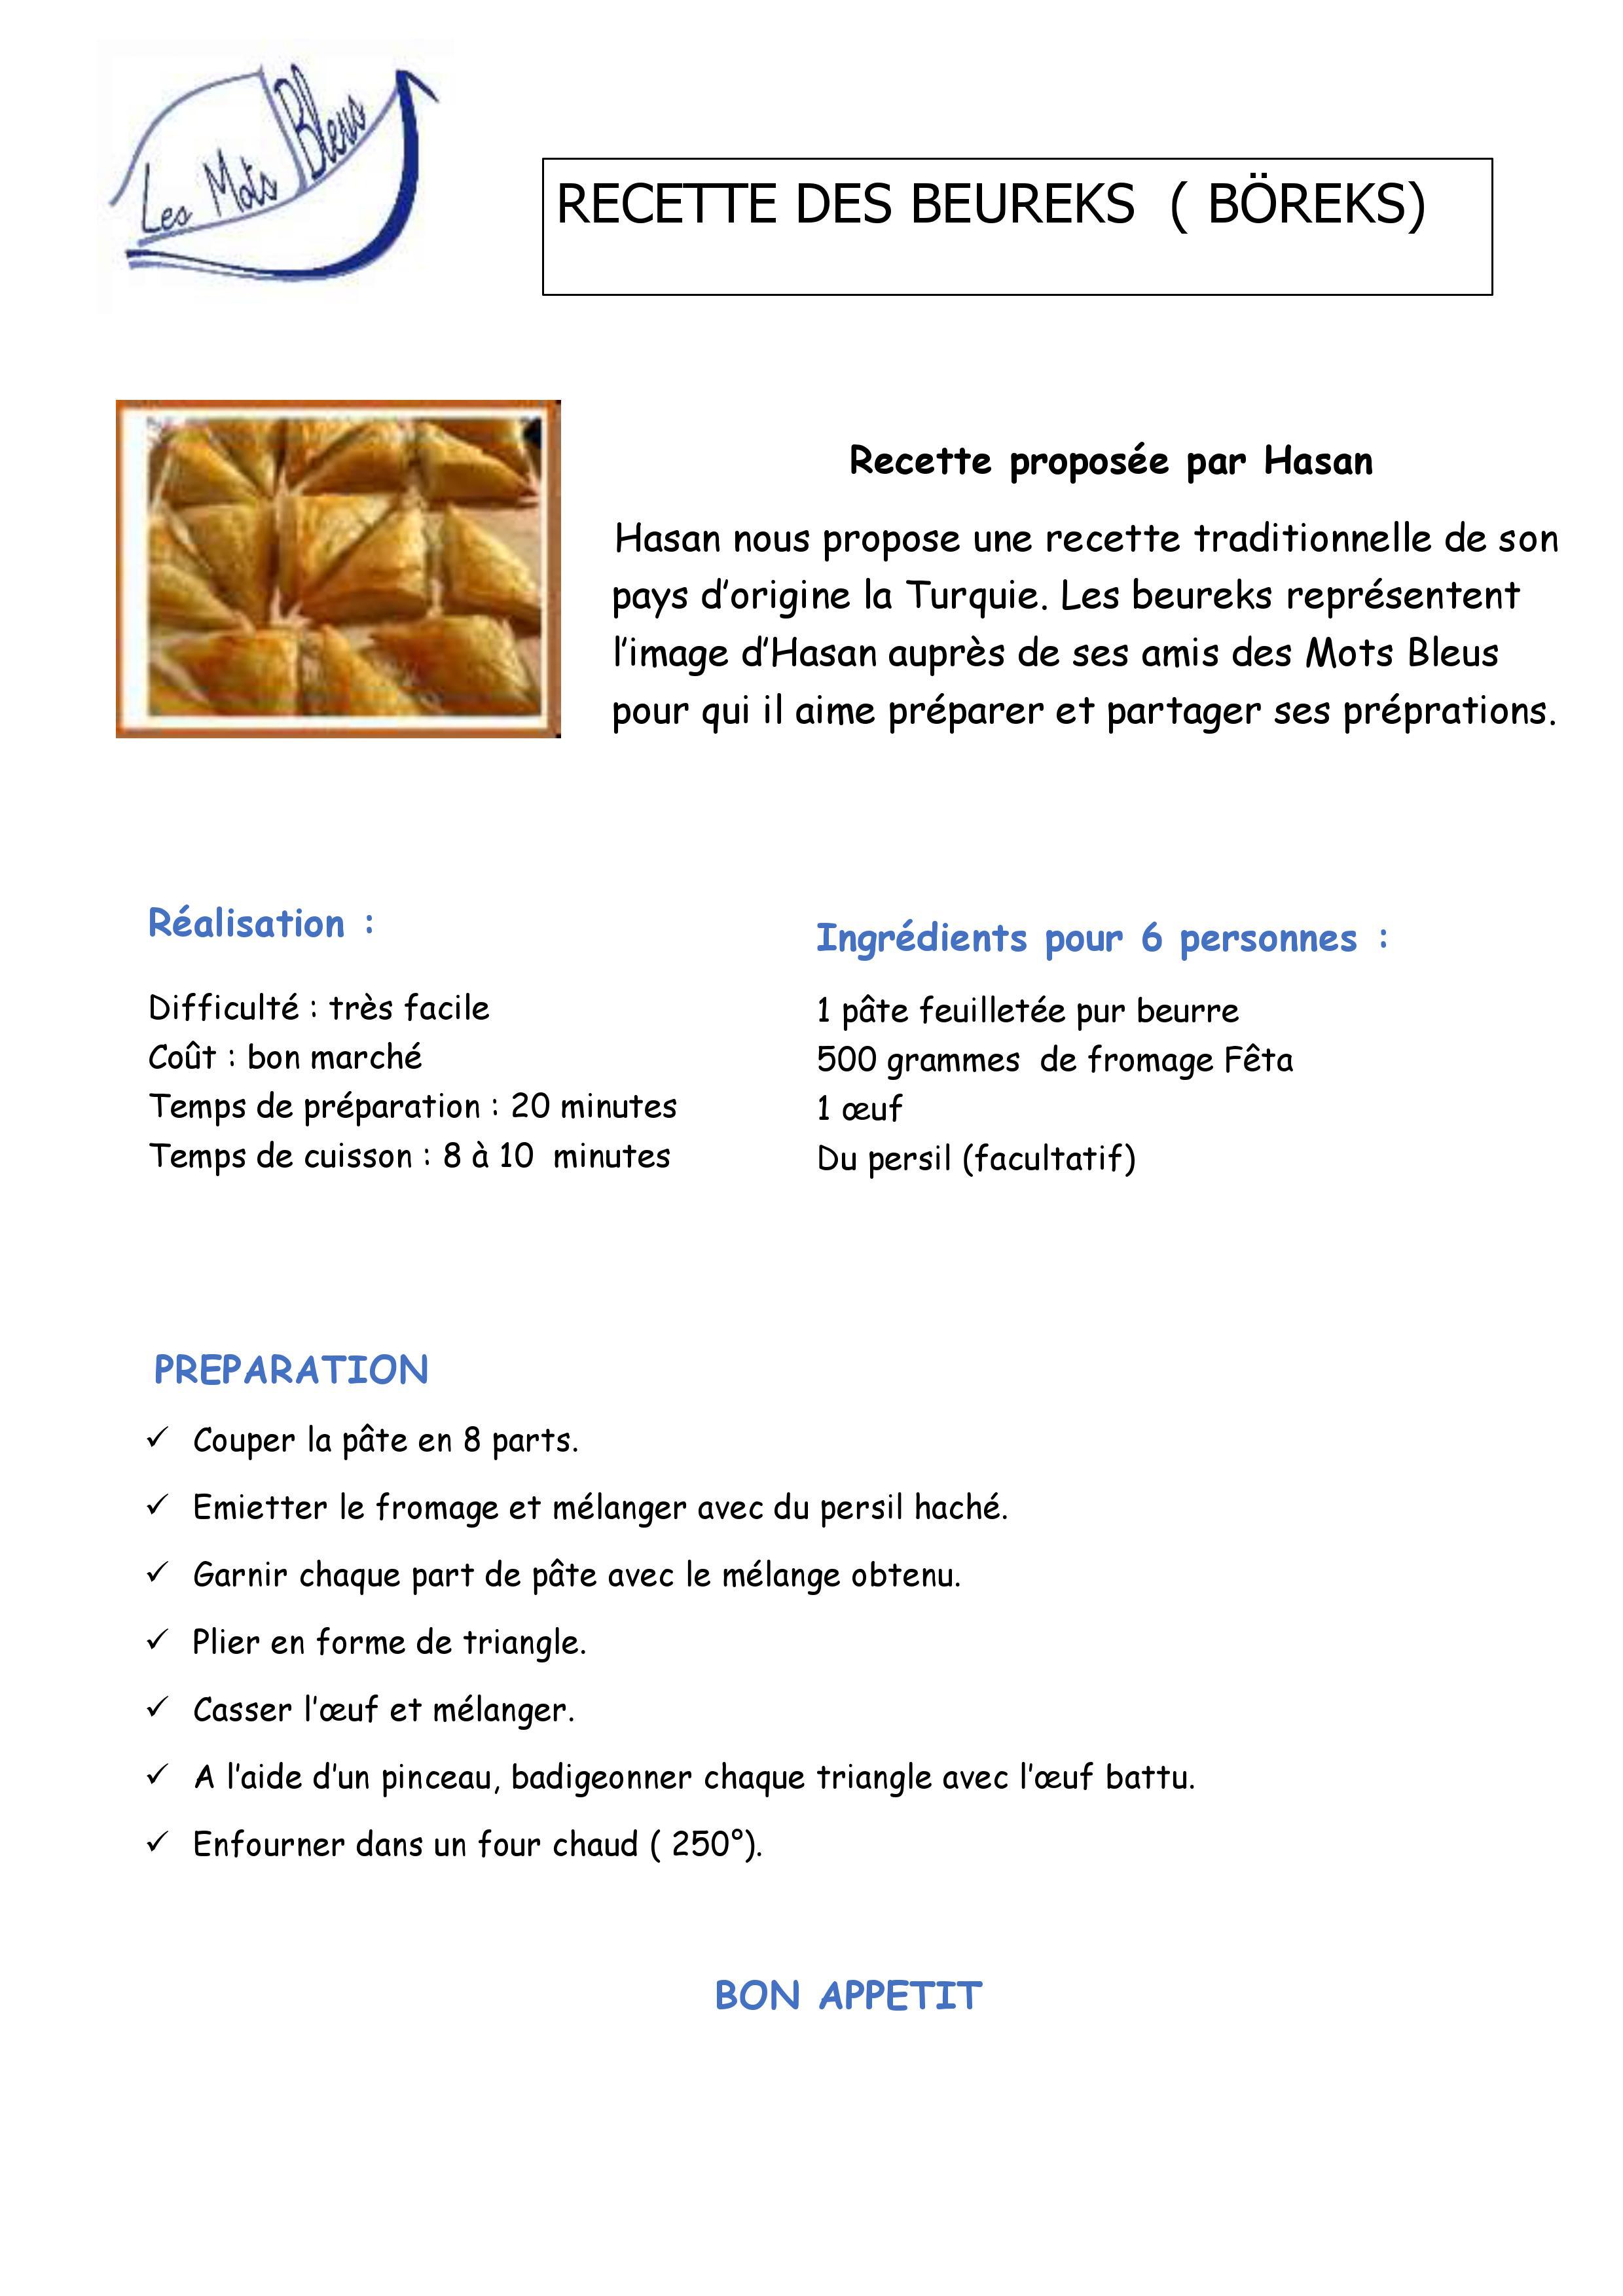 recette des beurecks.jpg